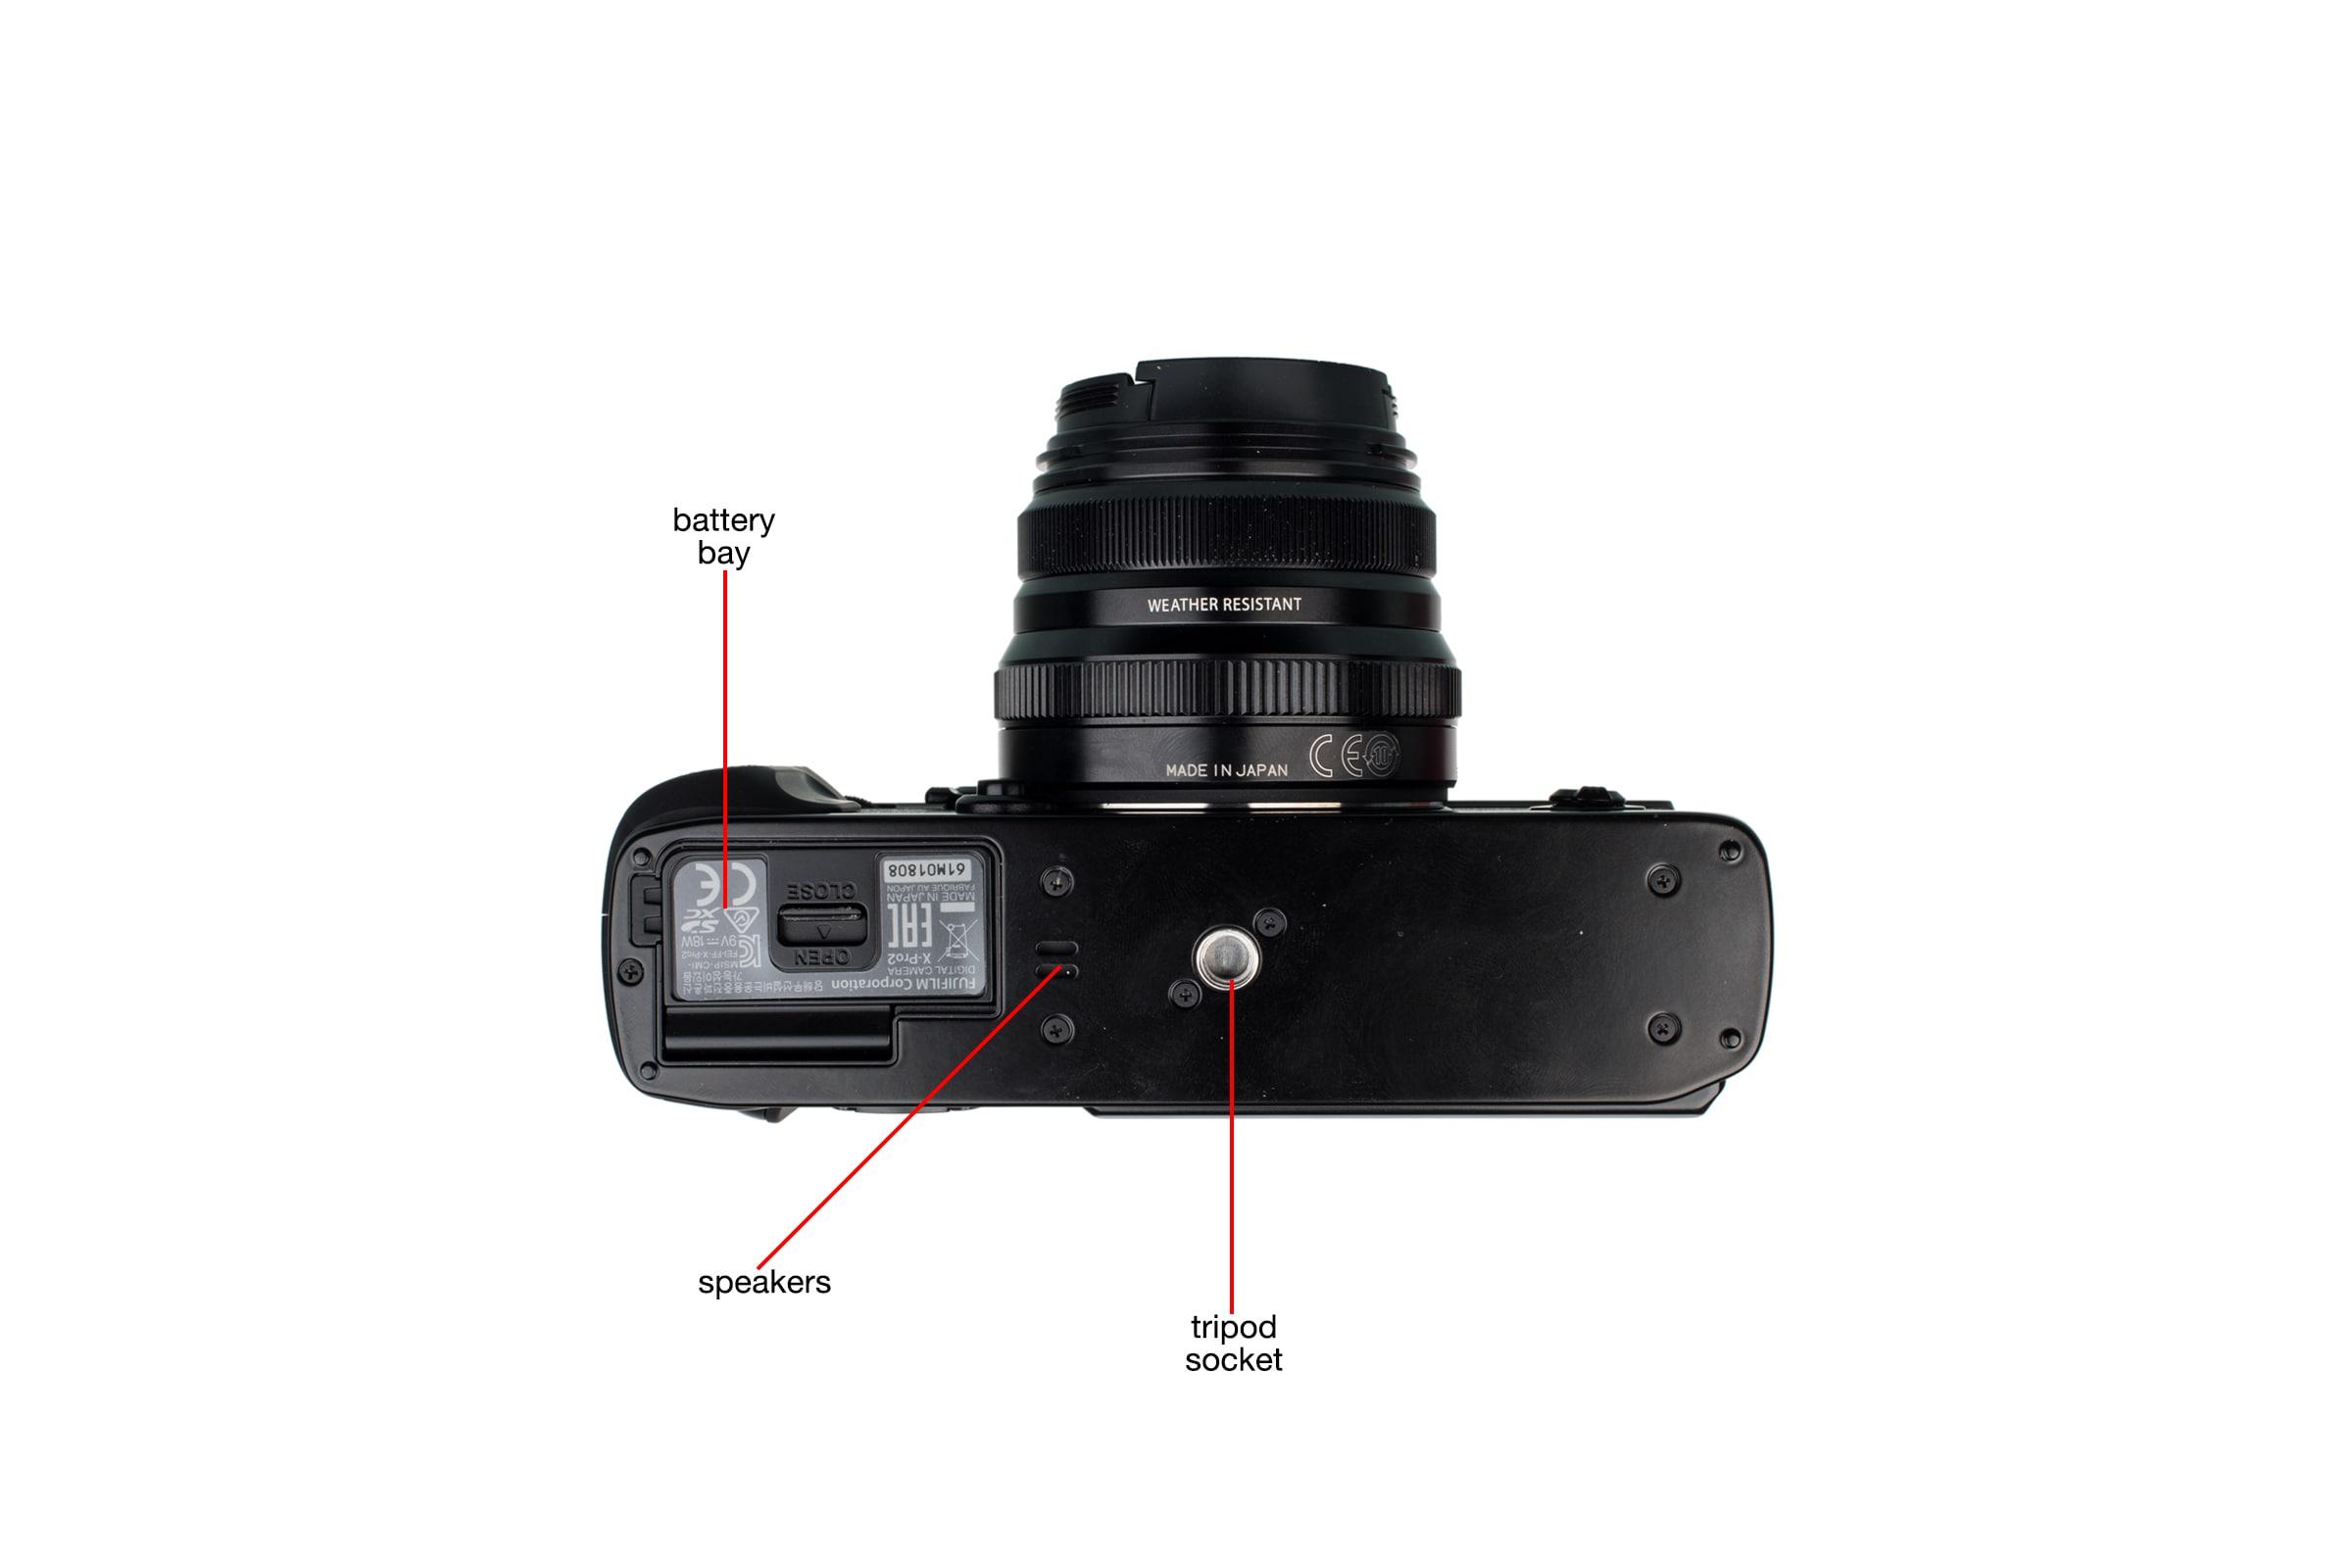 Bottom view of the Fujifilm X-Pro2.